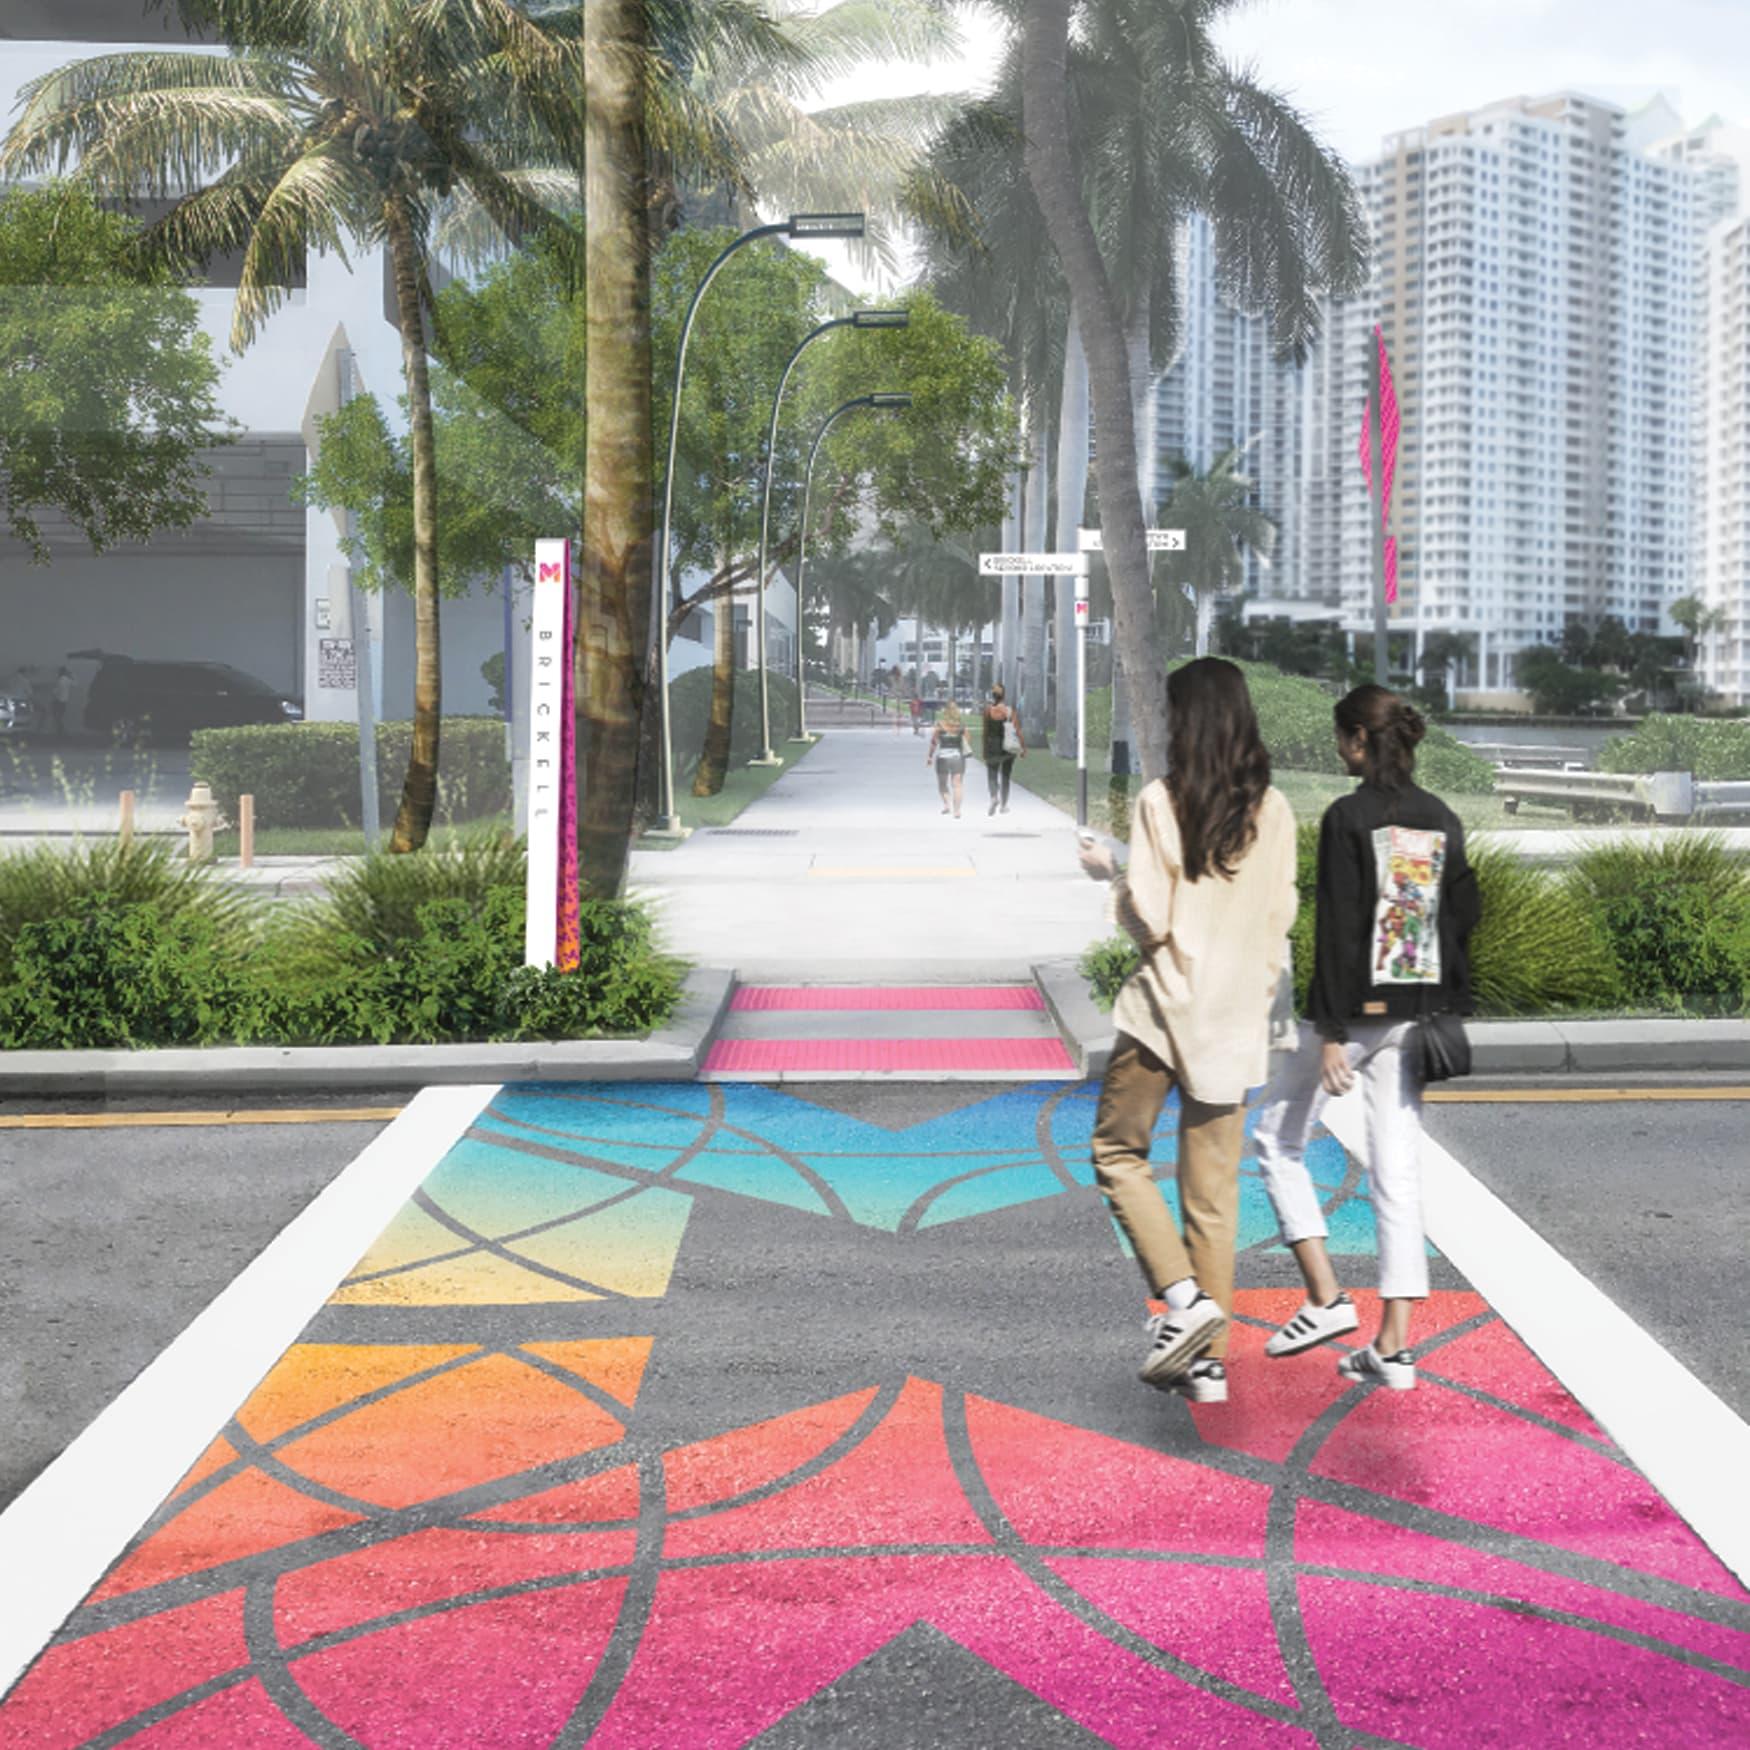 Miami Baywalk Waterfront Design and Crosswalk Design